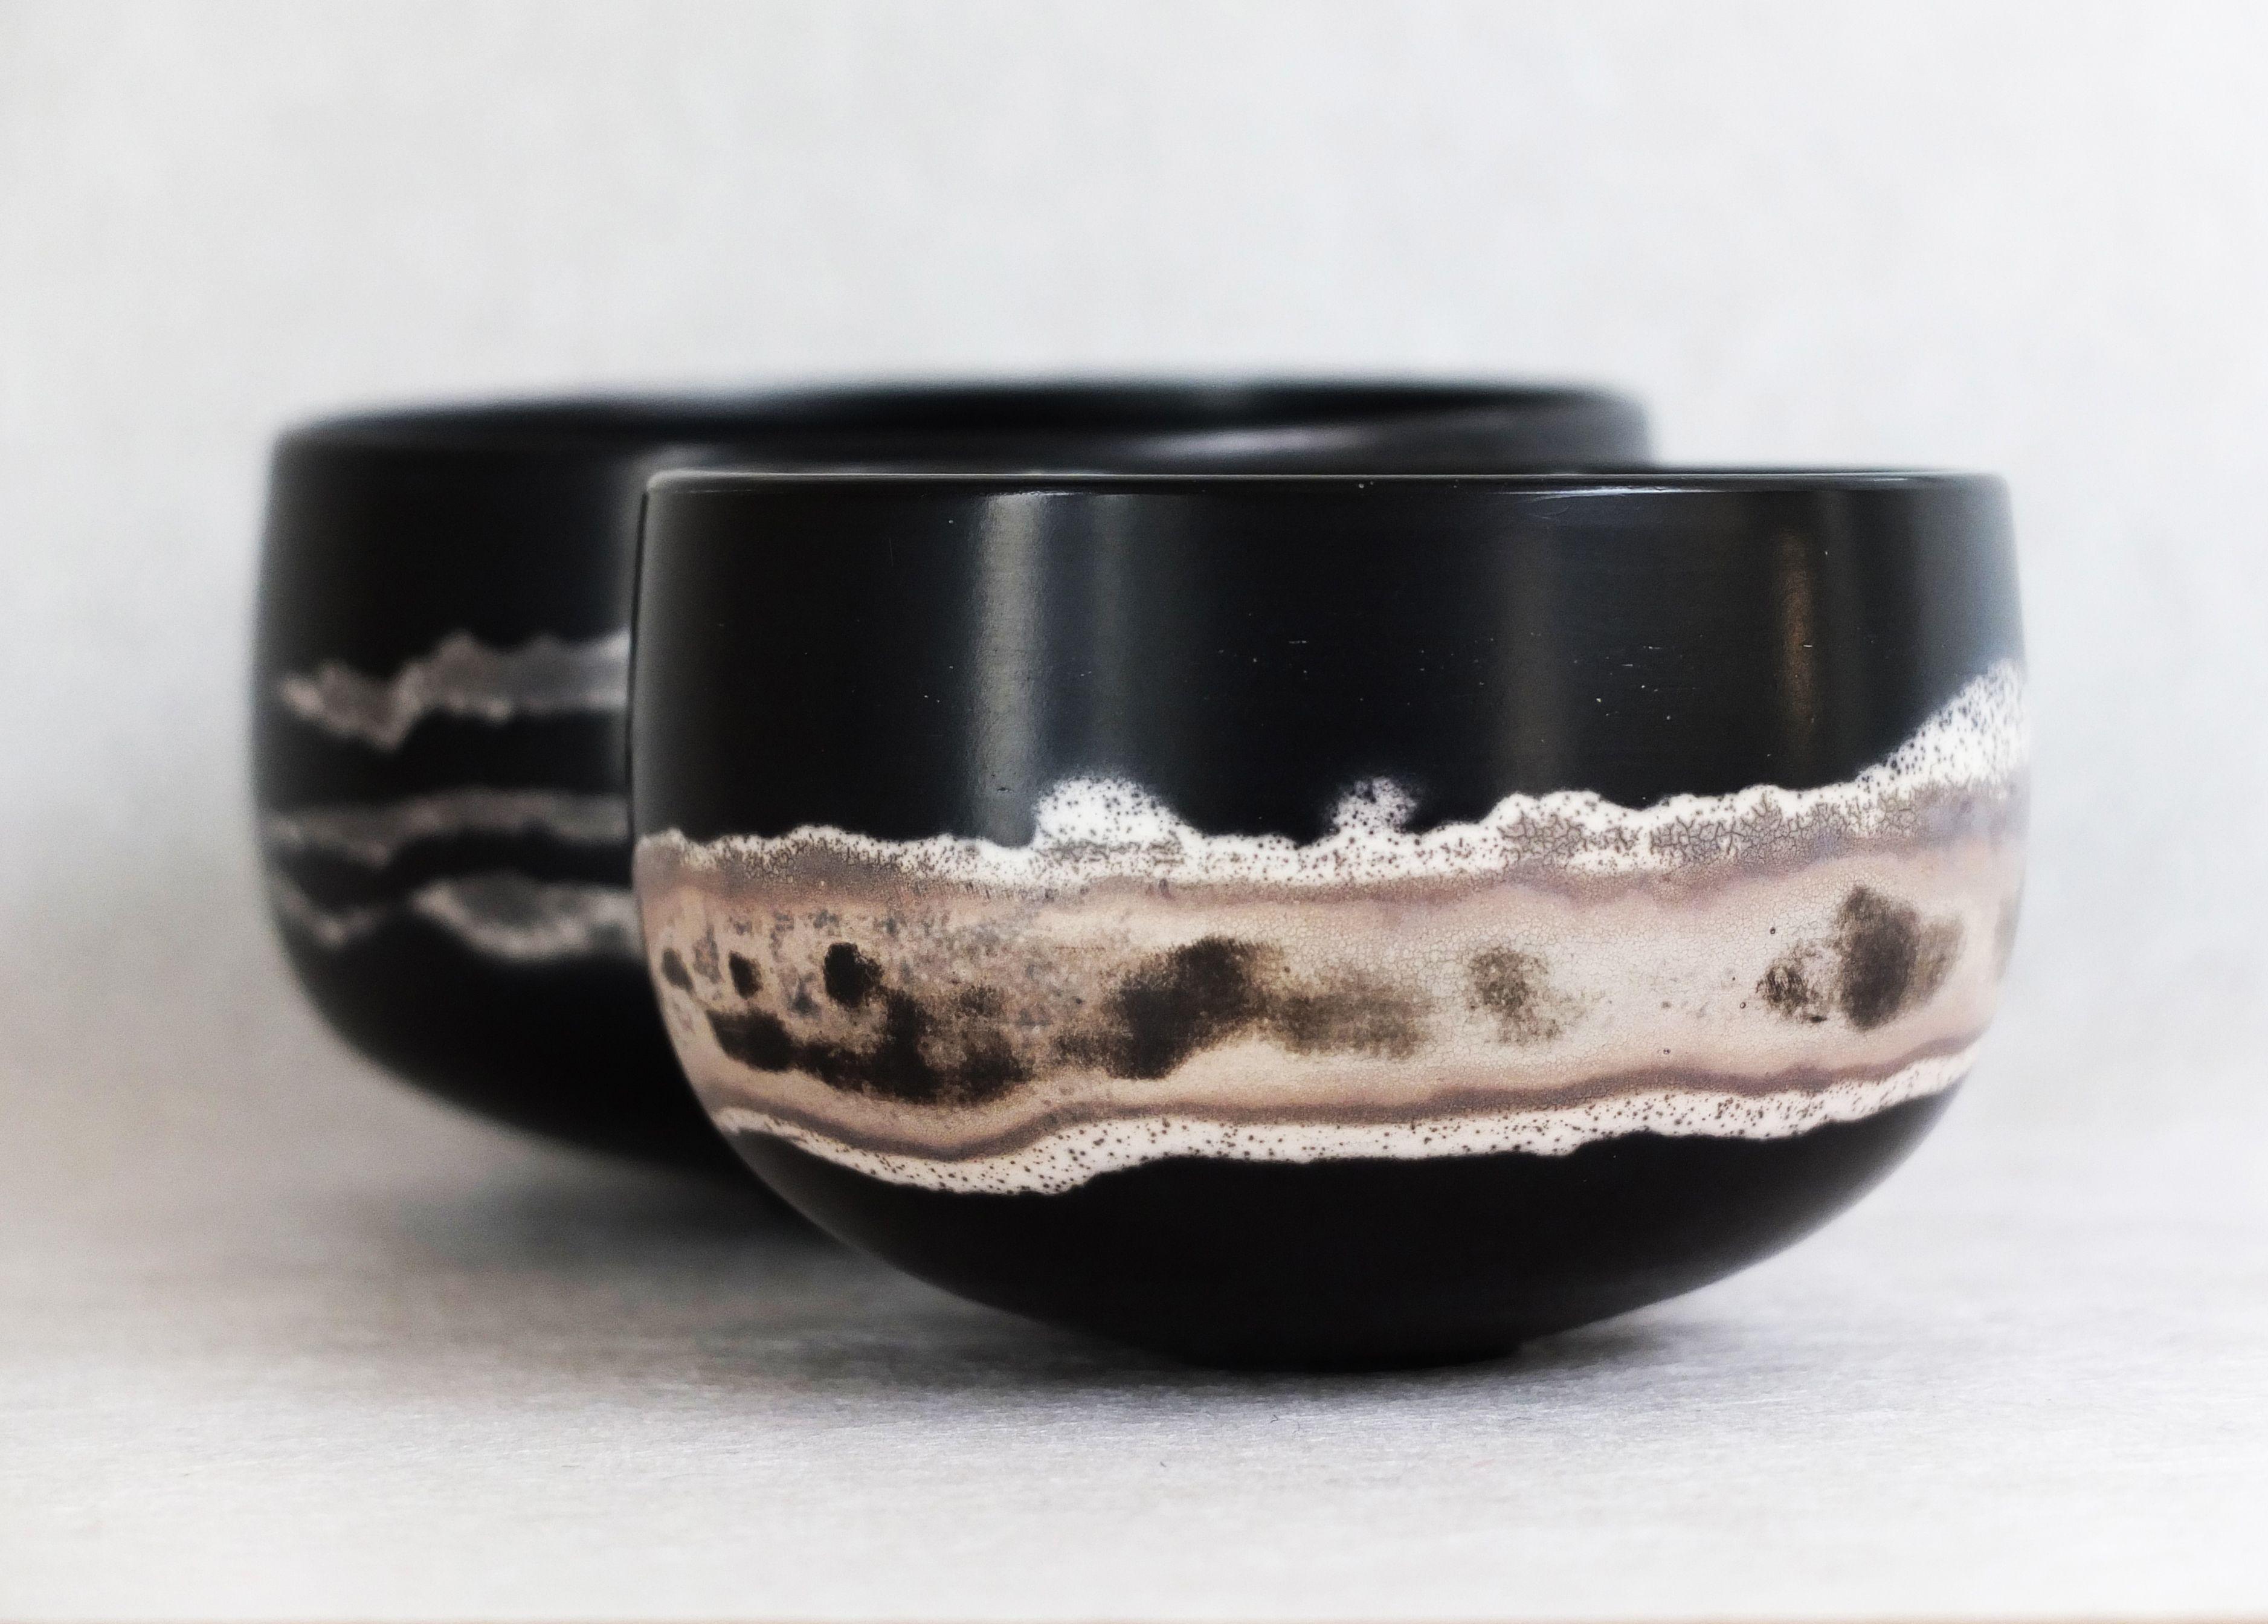 suzy balkert: 2 bowls